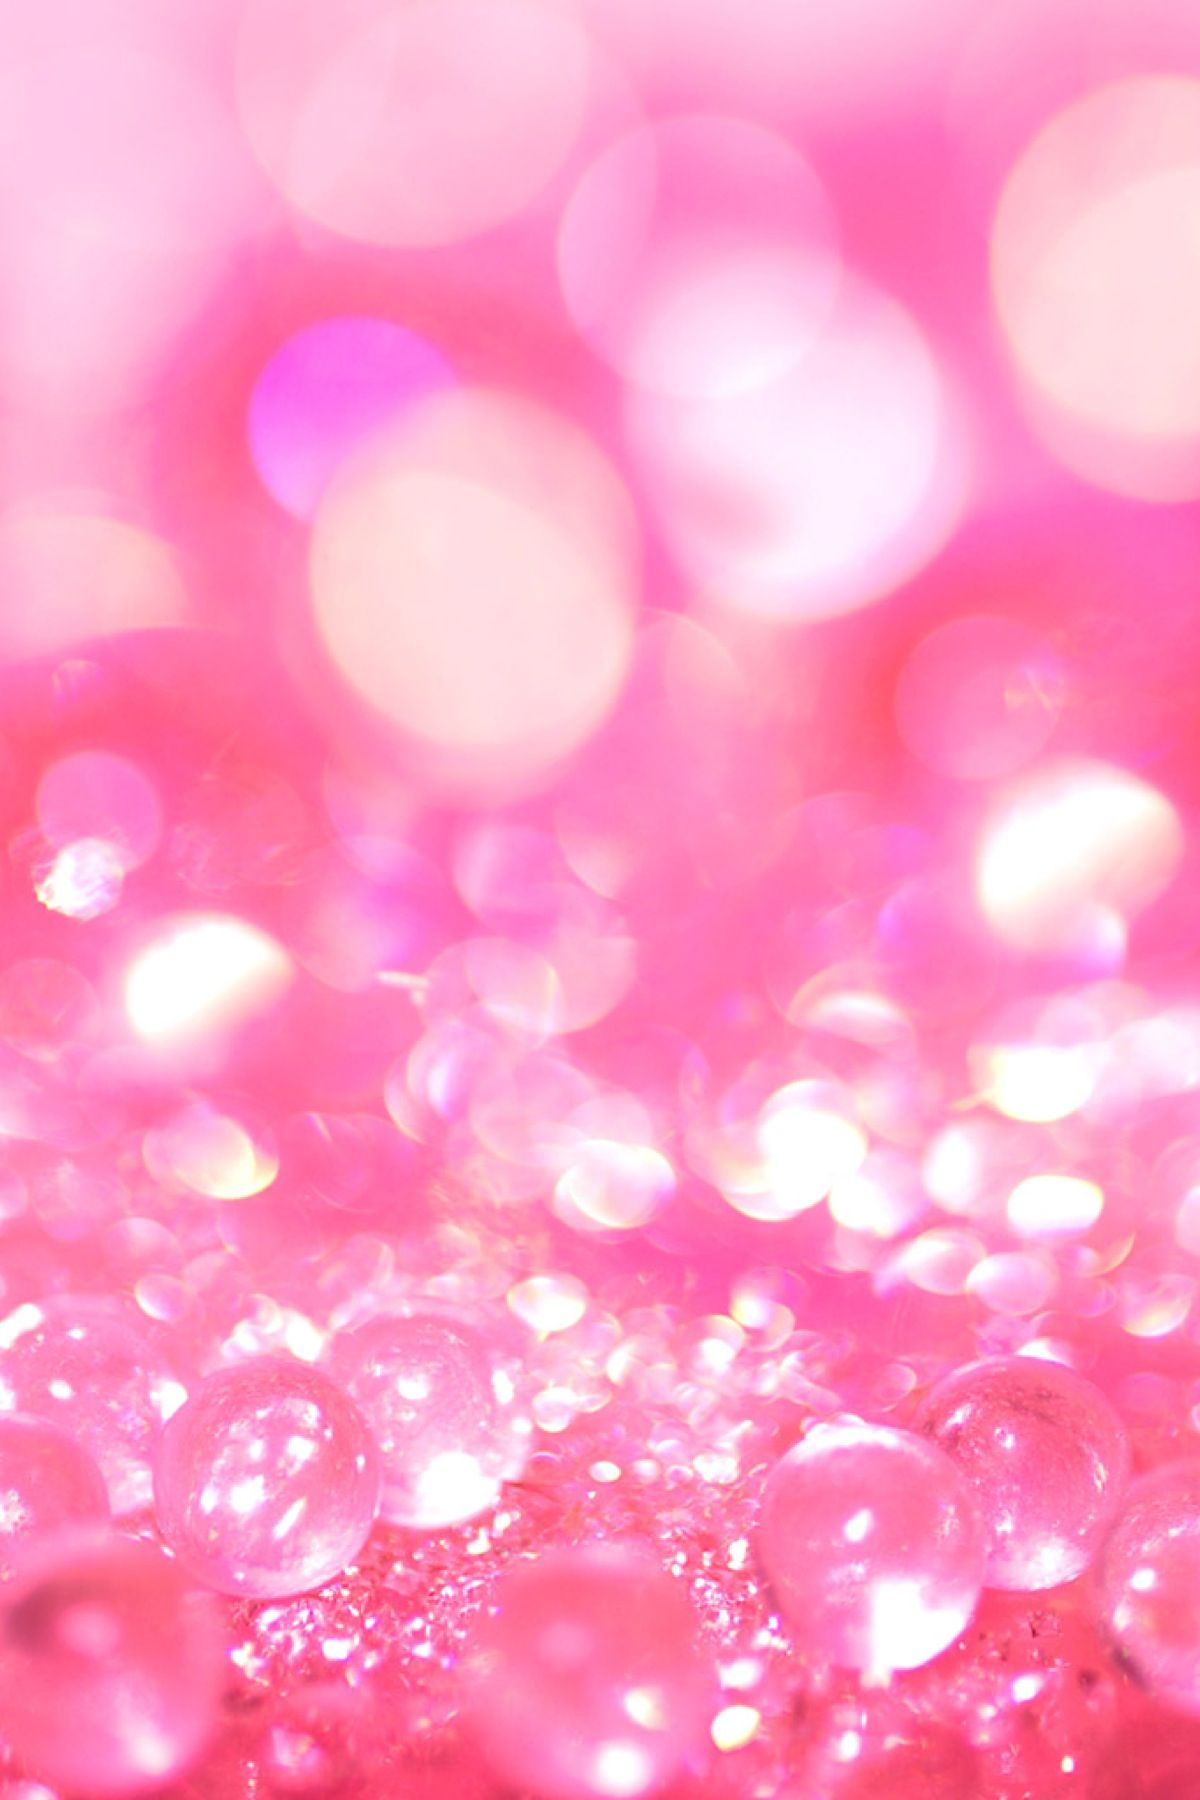 Pink_sparkles imgur